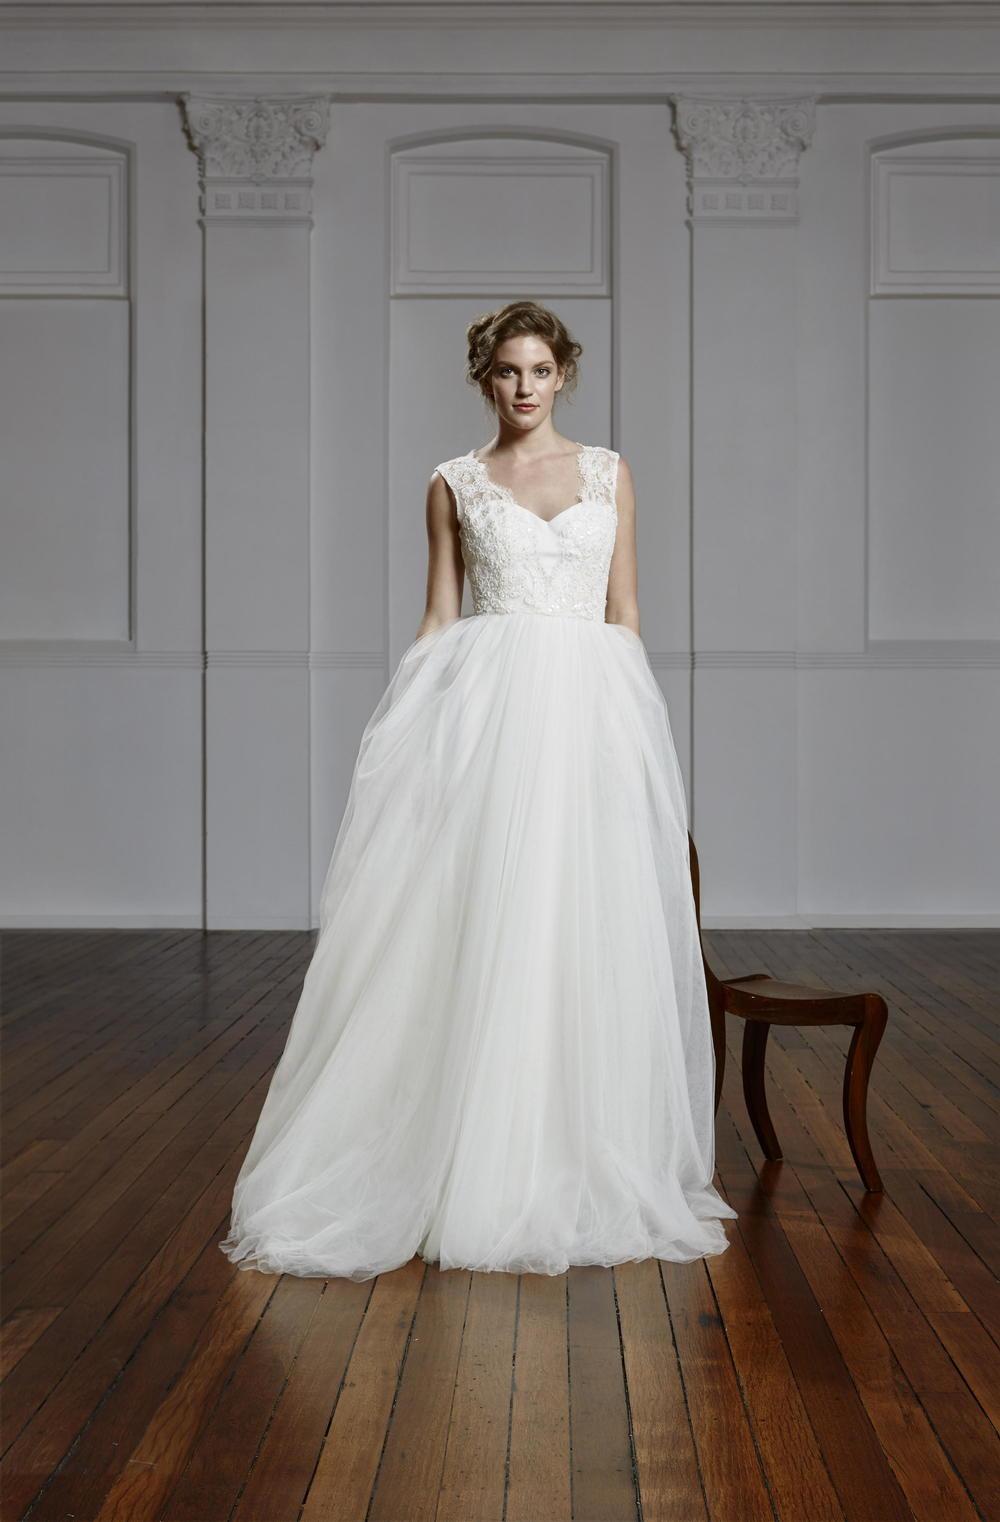 Valentina bridal design_TanyaAnic_©GrantSparkesCarroll_200a.jpg